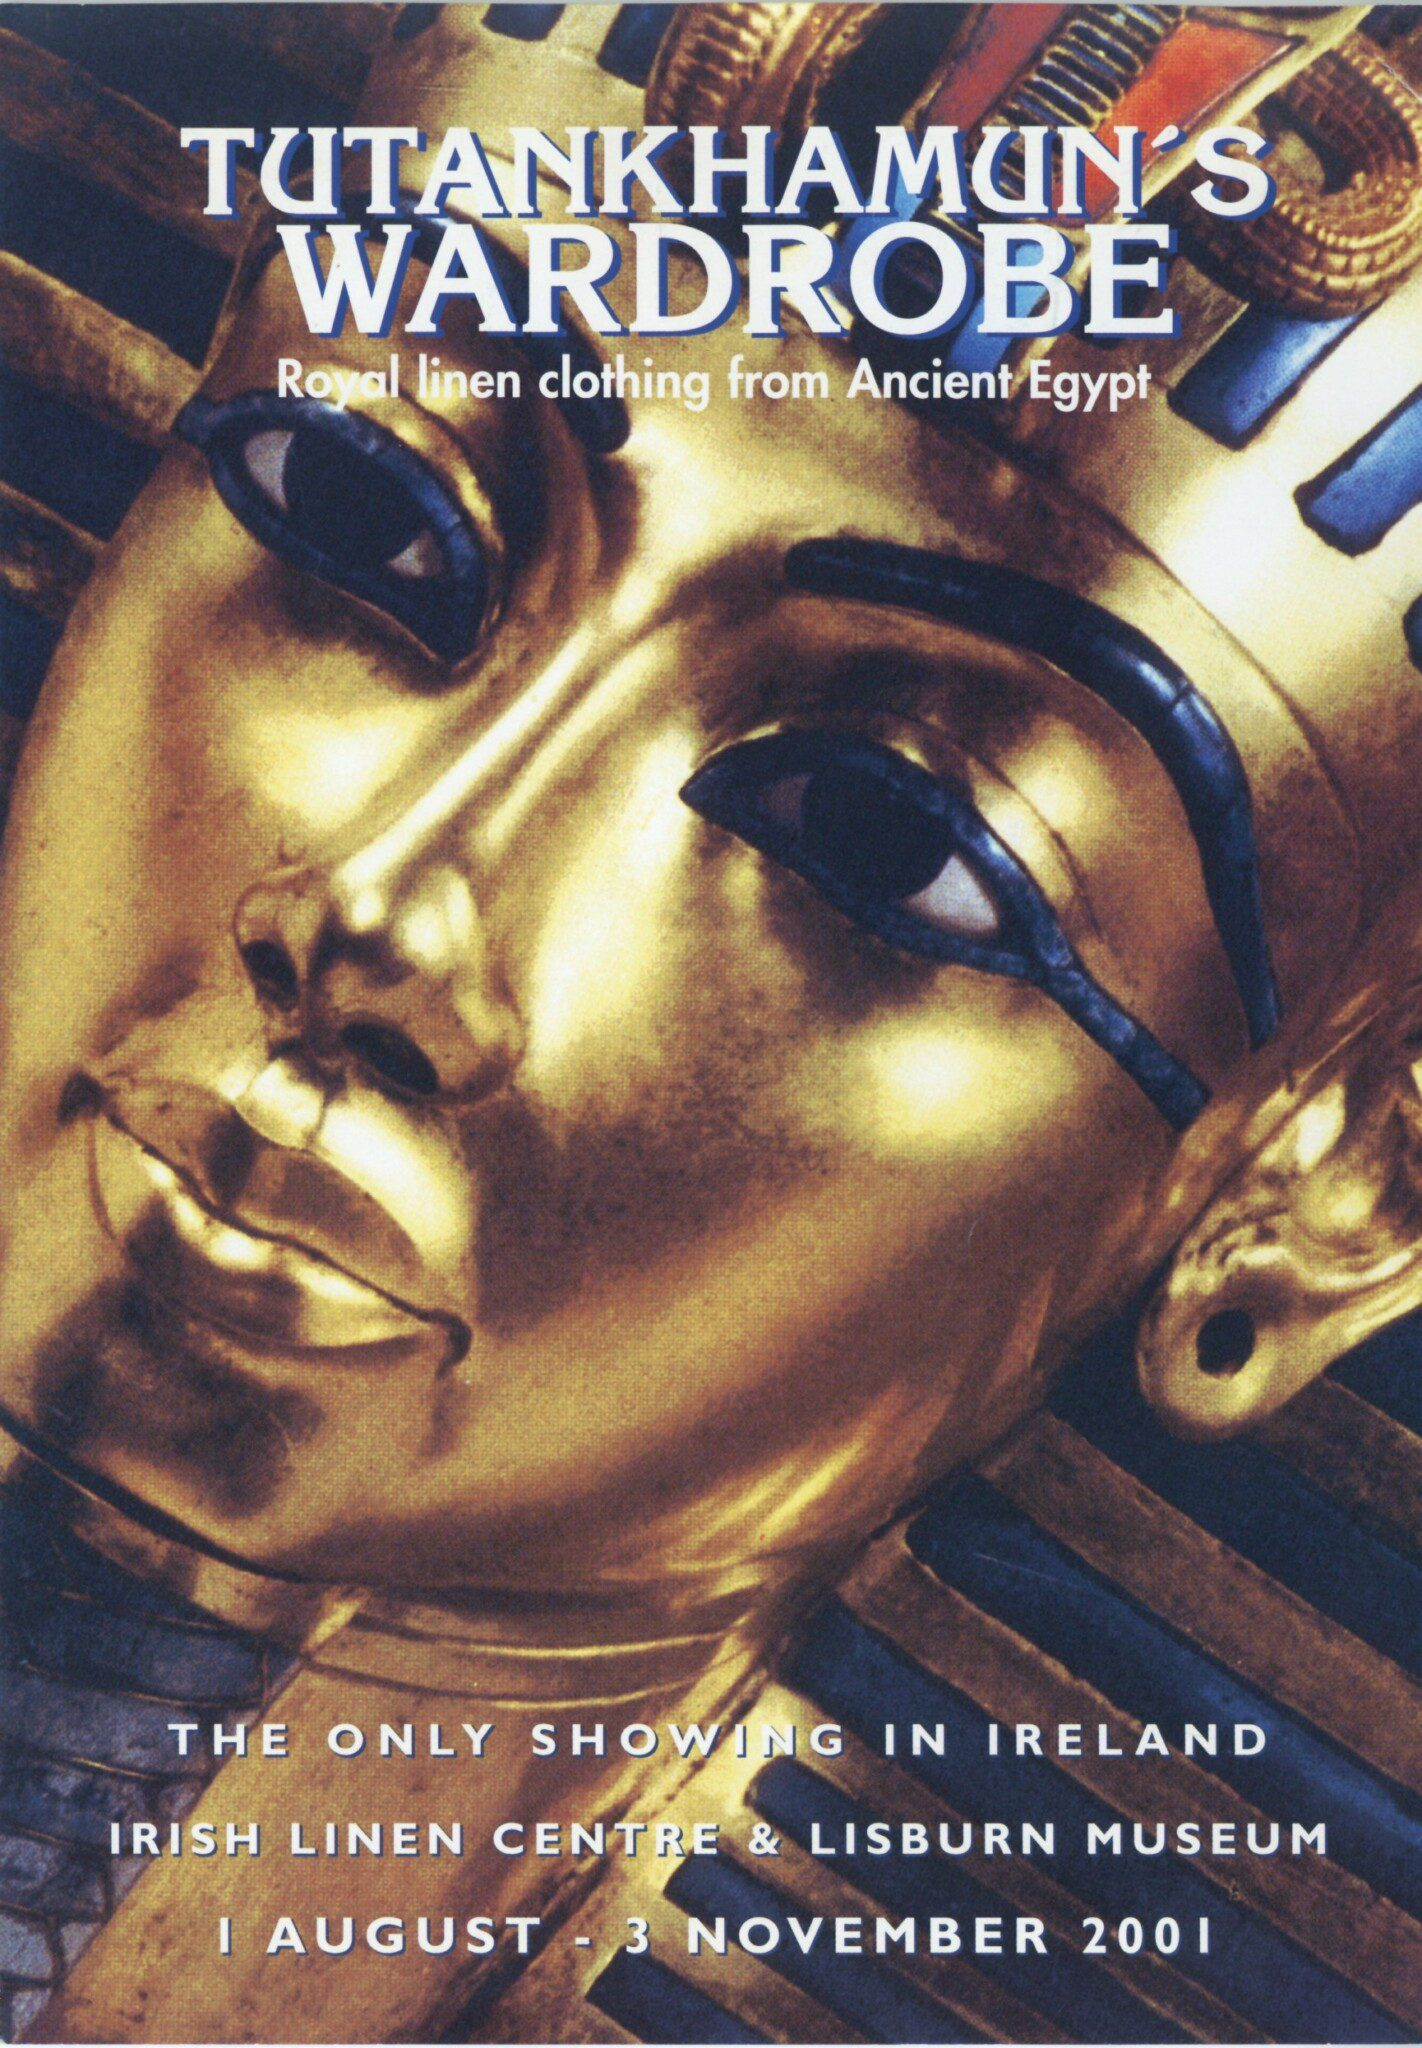 Tutankhamun's Wardrobe Exhibition, Lisburn, 2001